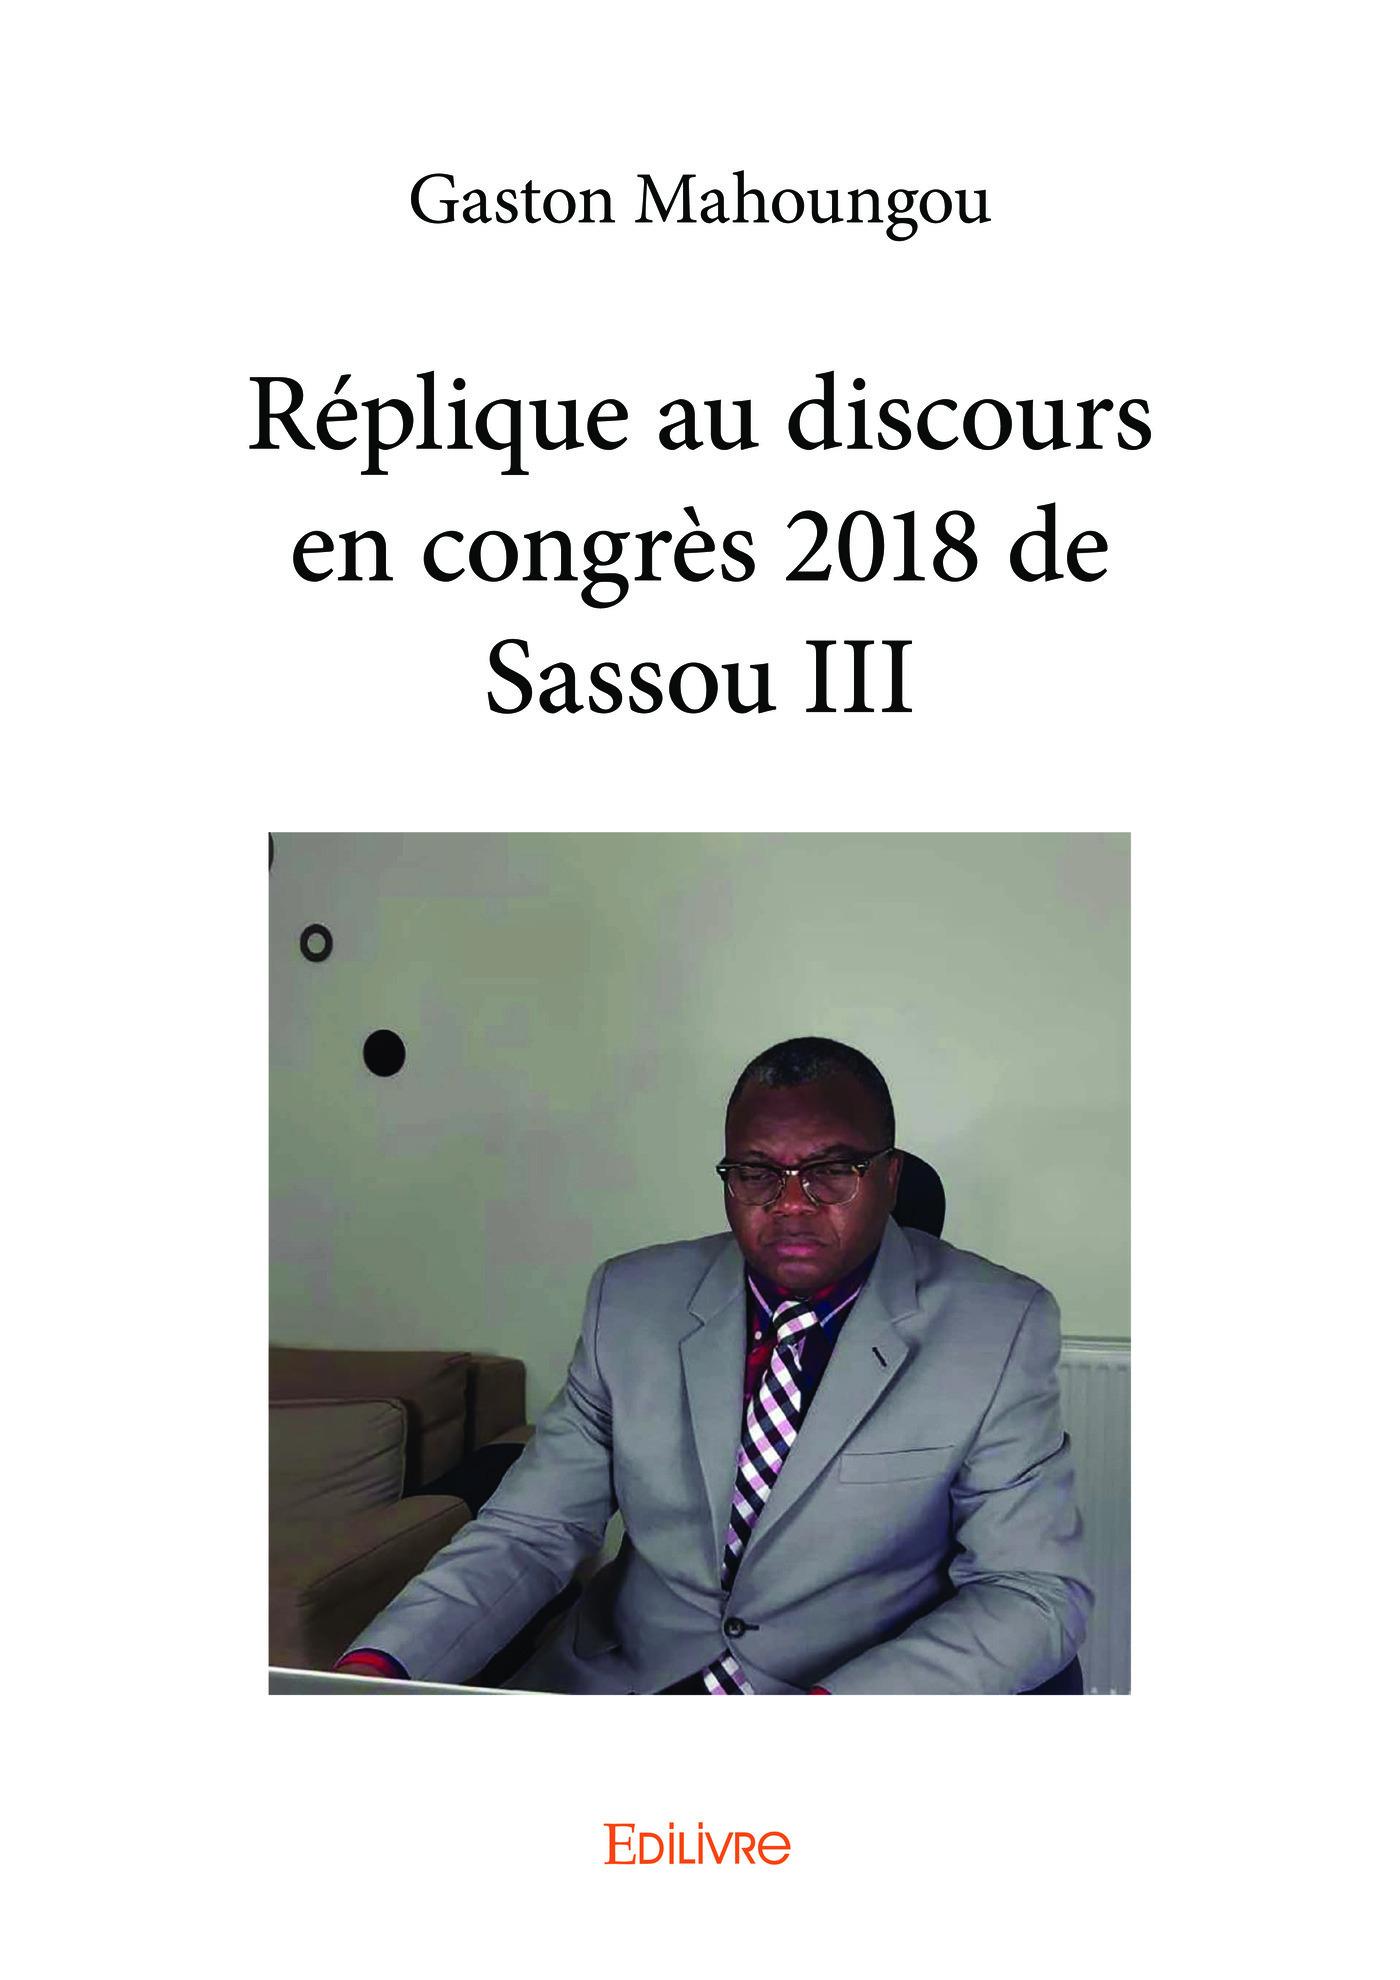 Réplique au discours en congrès 2018 de Sassou III  - Gaston Mahoungou